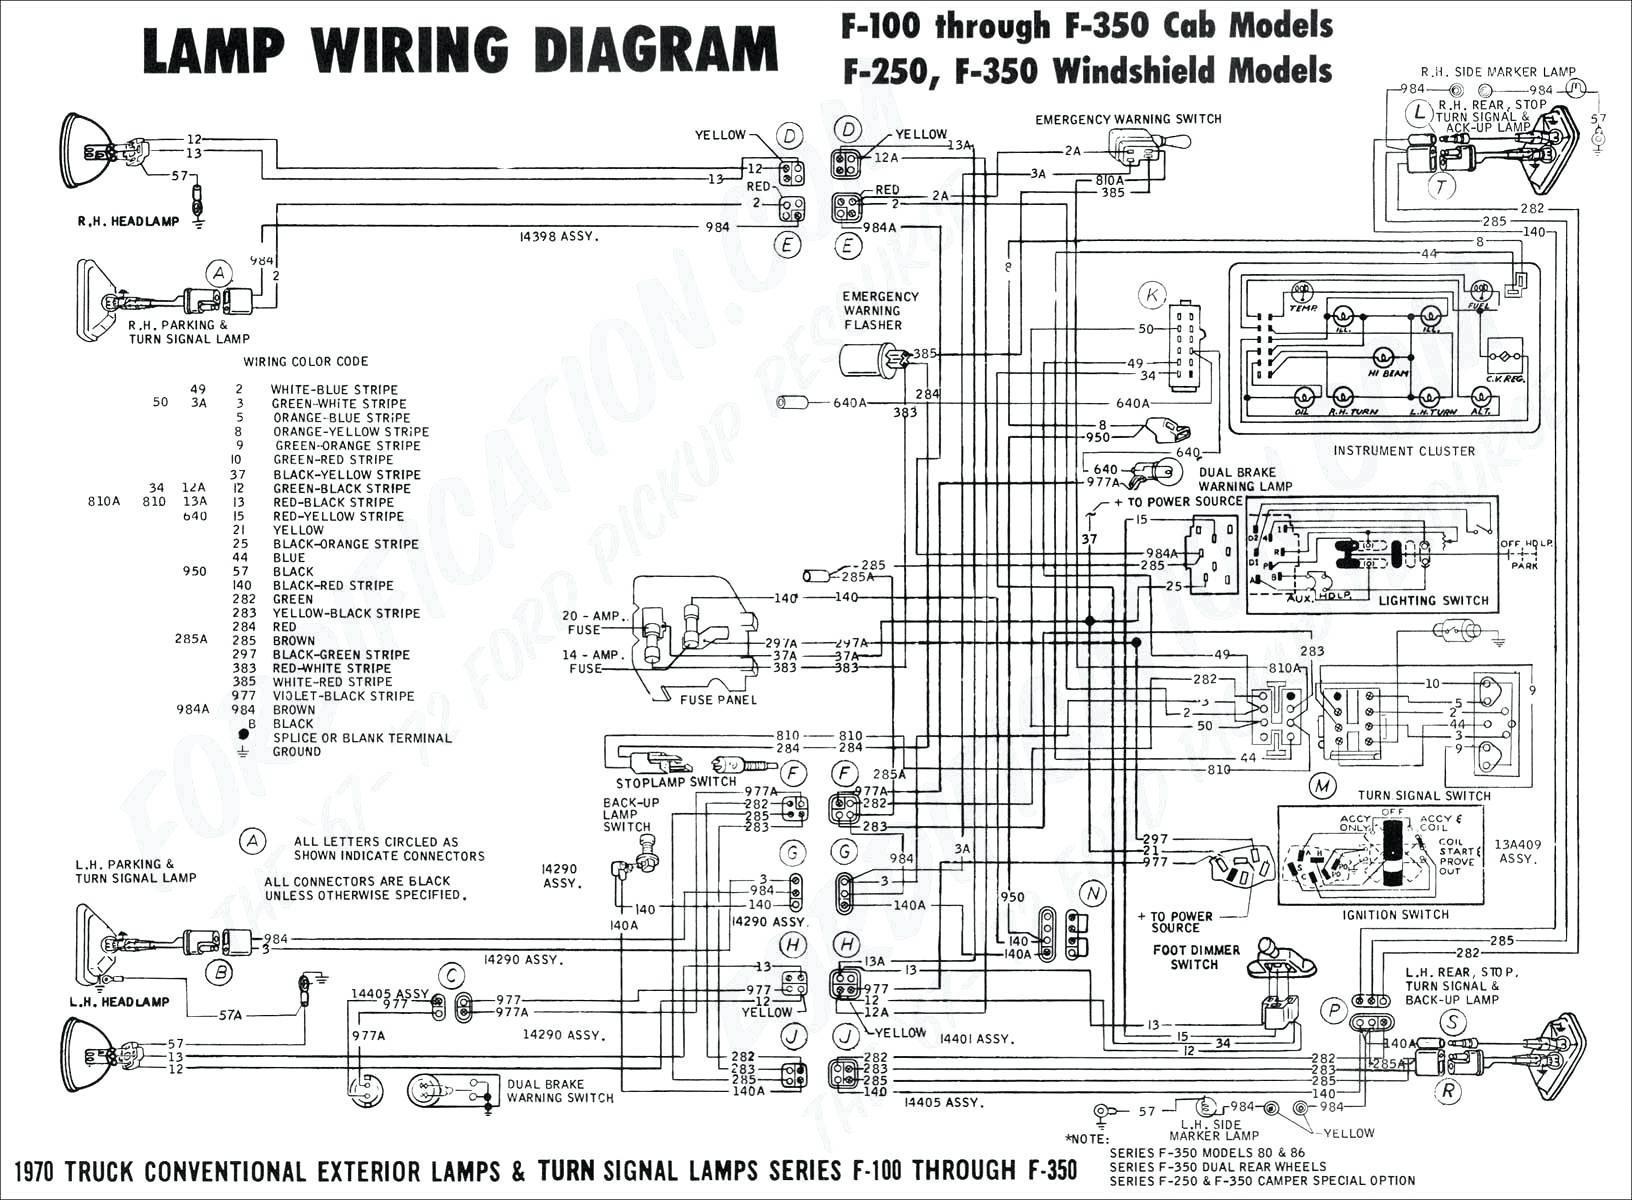 2000 Nissan Maxima Engine Diagram 2000 Nissan Maxima Fuse Diagram Of 2000 Nissan Maxima Engine Diagram